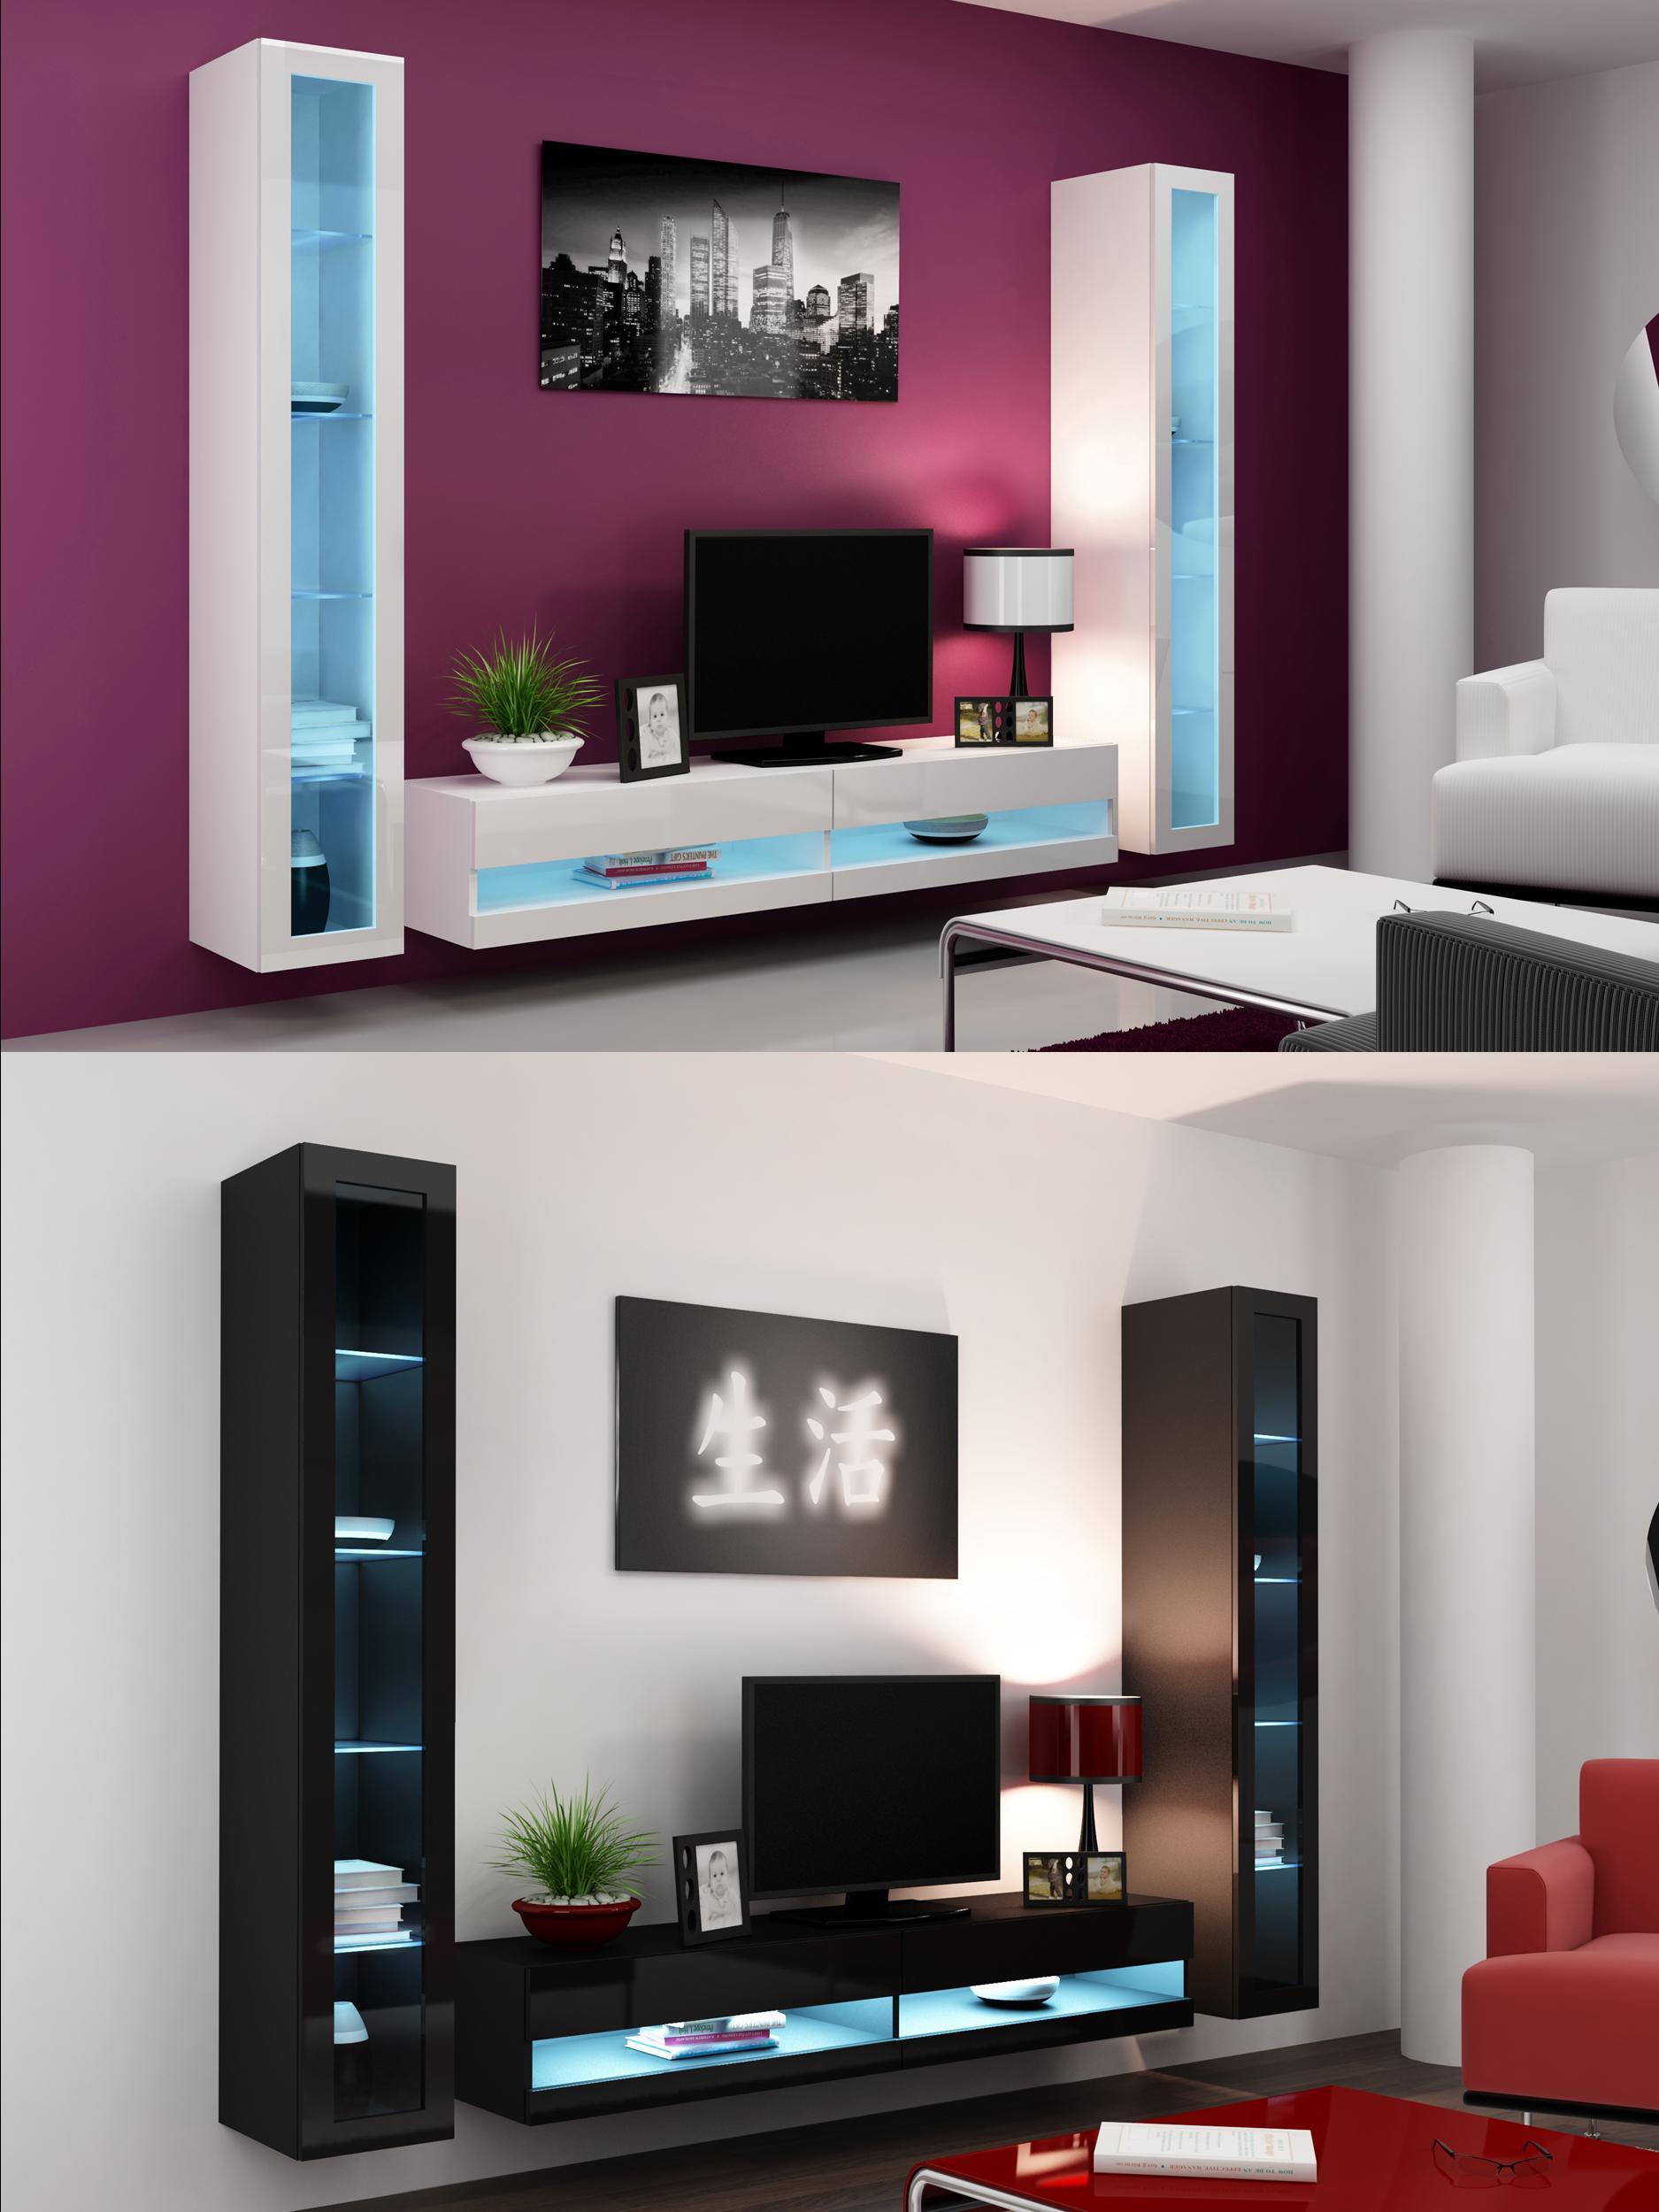 Led Cabinet For Living Room Nrtradiant com